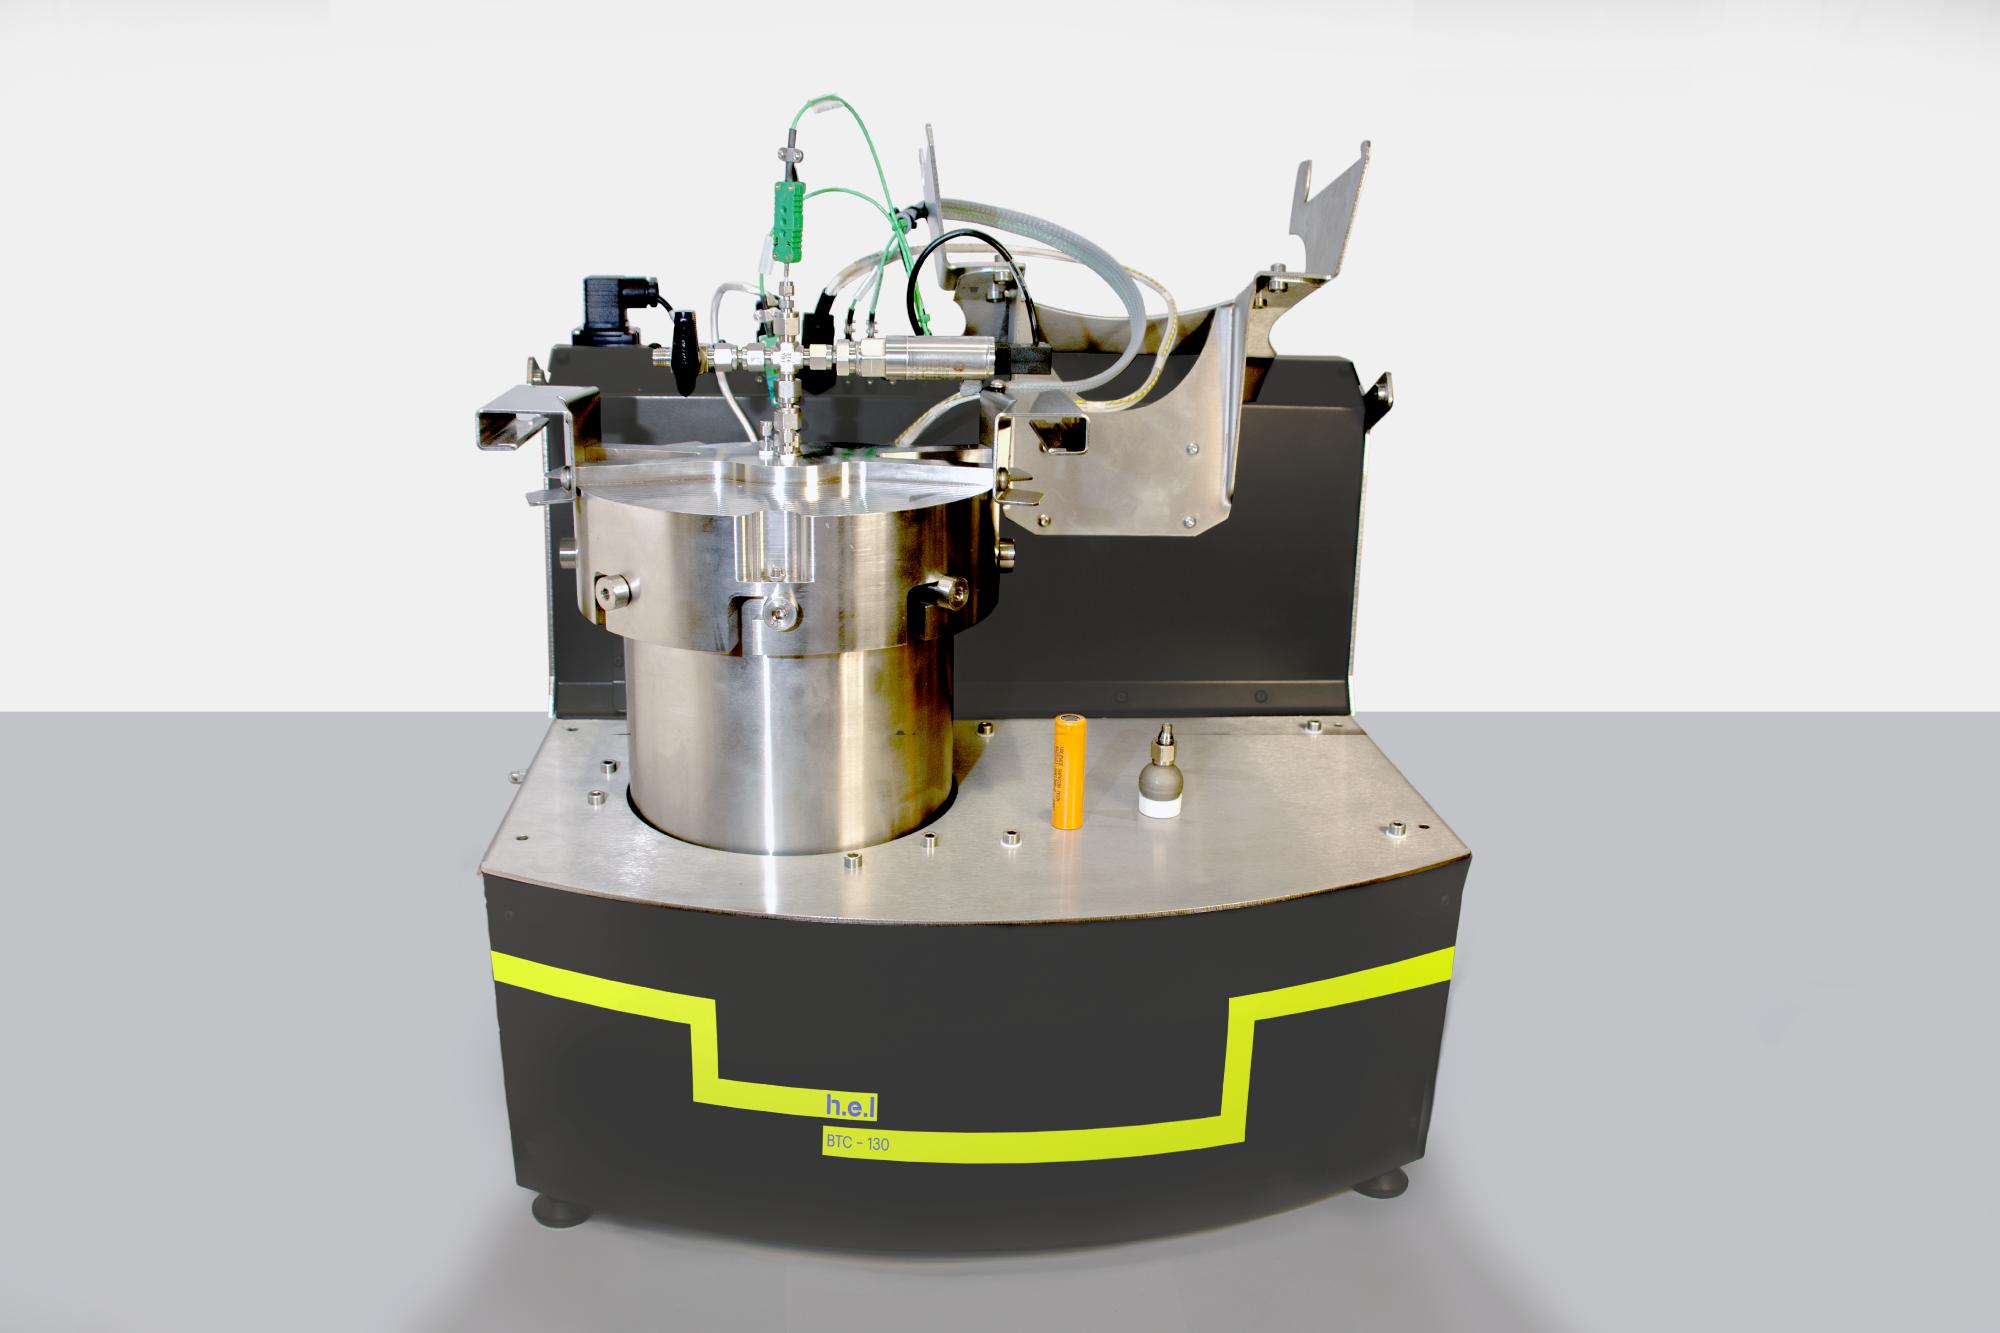 BTC-130: A Bench-Top, Battery Safety Testing, Adiabatic Calorimeter